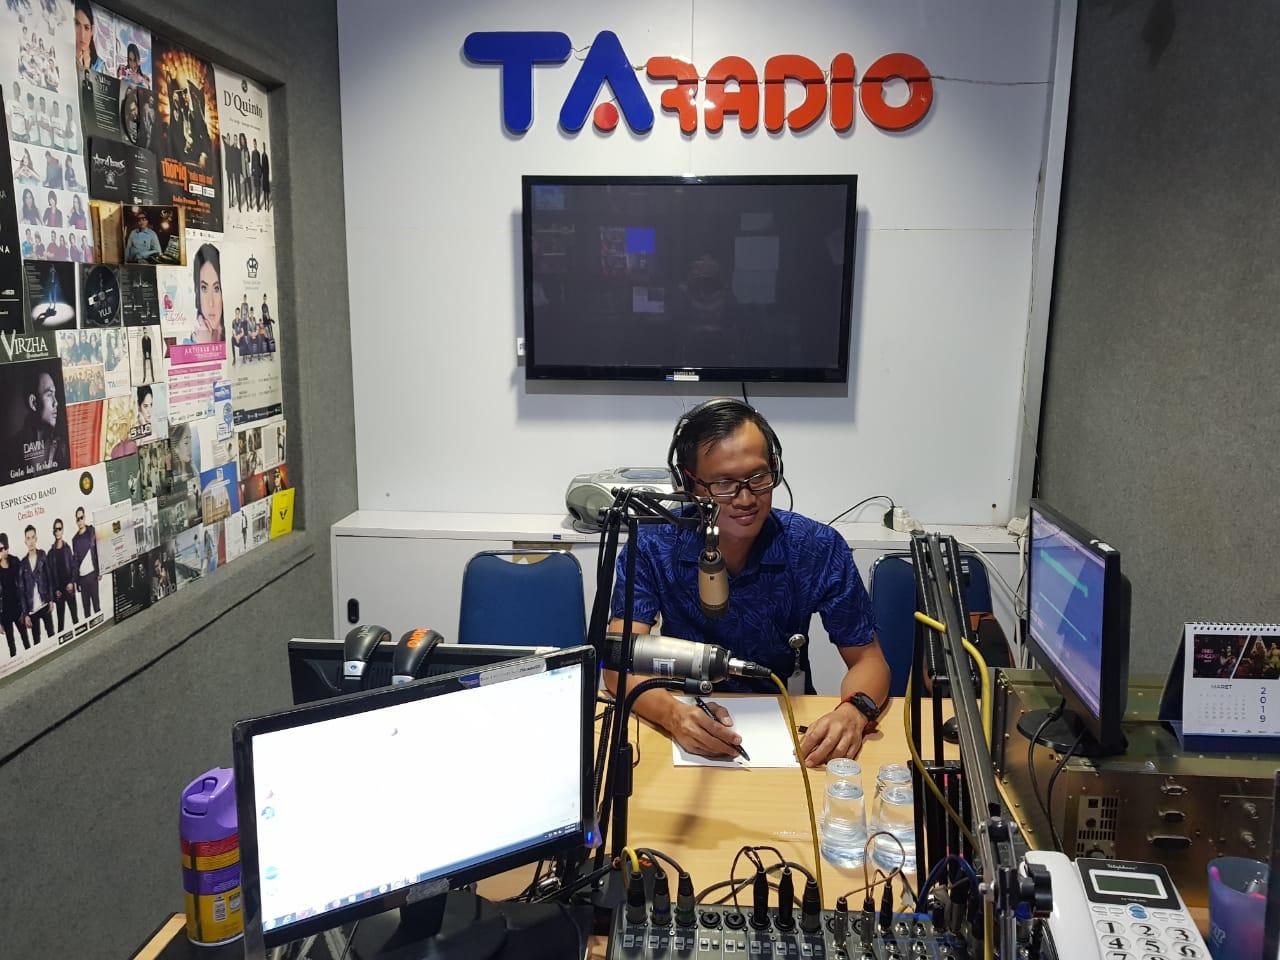 Dosen FK menjadi Narasumber tentang tonsilitis di TA Radio Surakarta